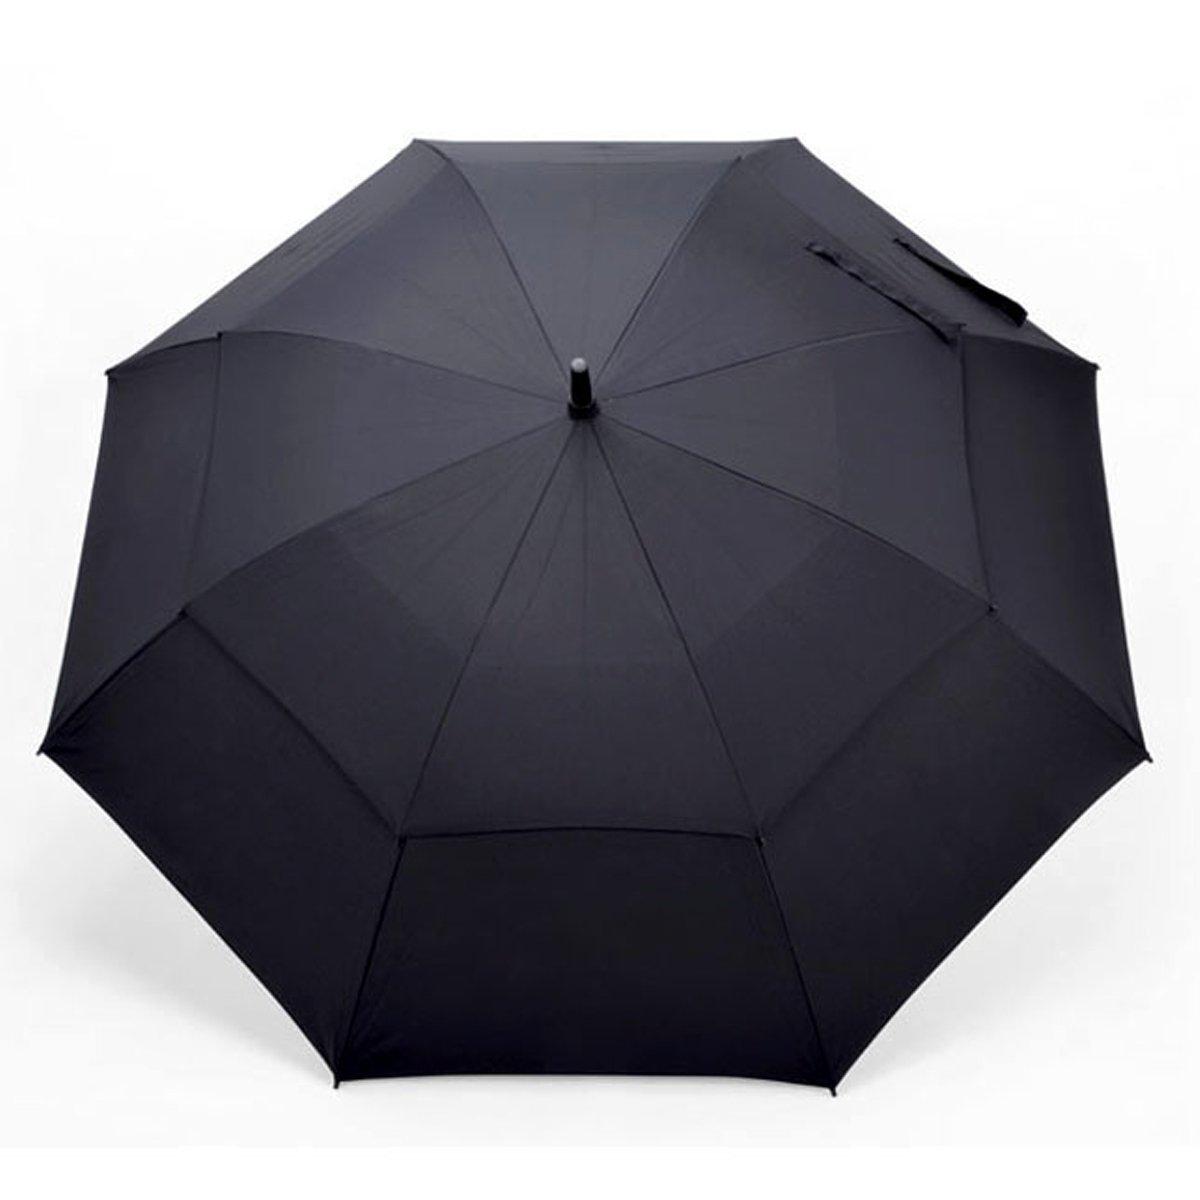 Vilapur Automatic Open Golf Umbrella(VP-03-001), Extra Large Umbrella Oversize Double Canopy Vented Windproof Waterproof Stick Umbrellas